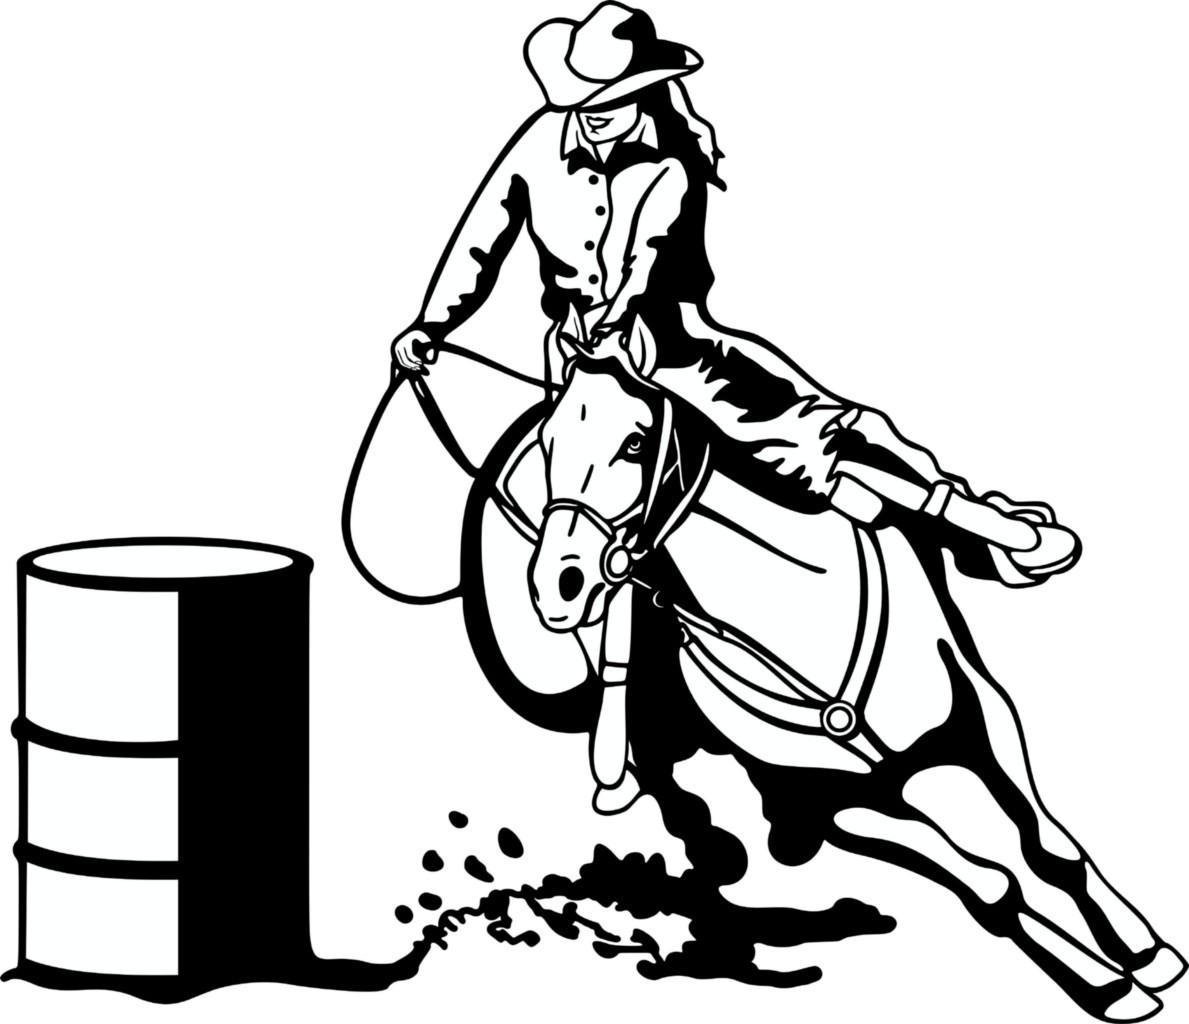 Free Barrel Racing Clipart Download Free Clip Art Free